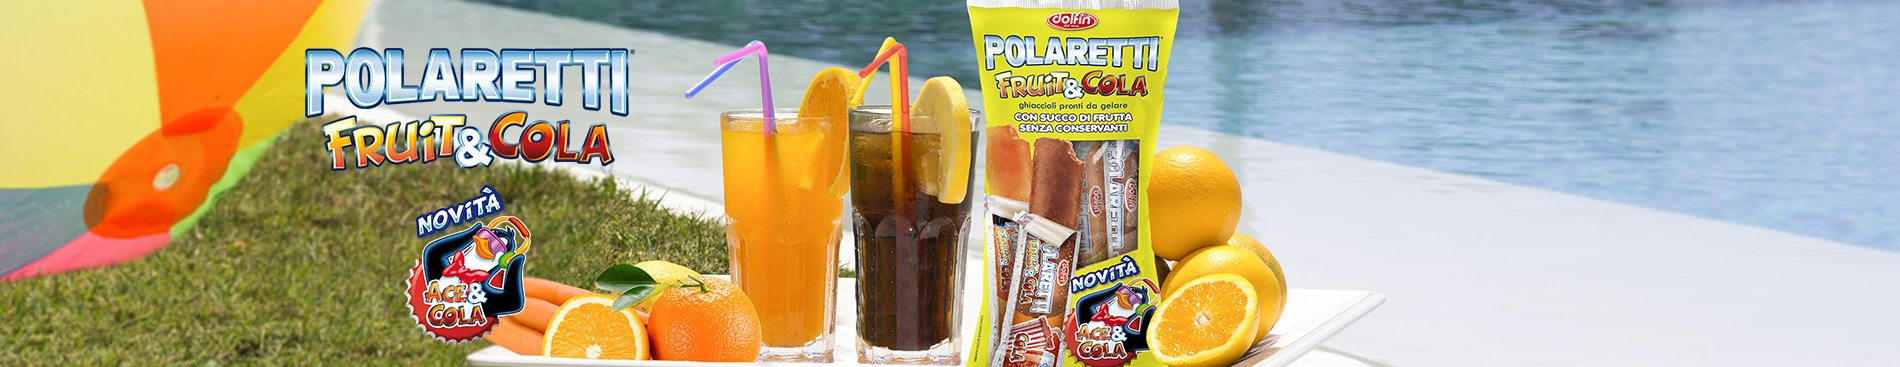 Polaretti Fruit&Cola